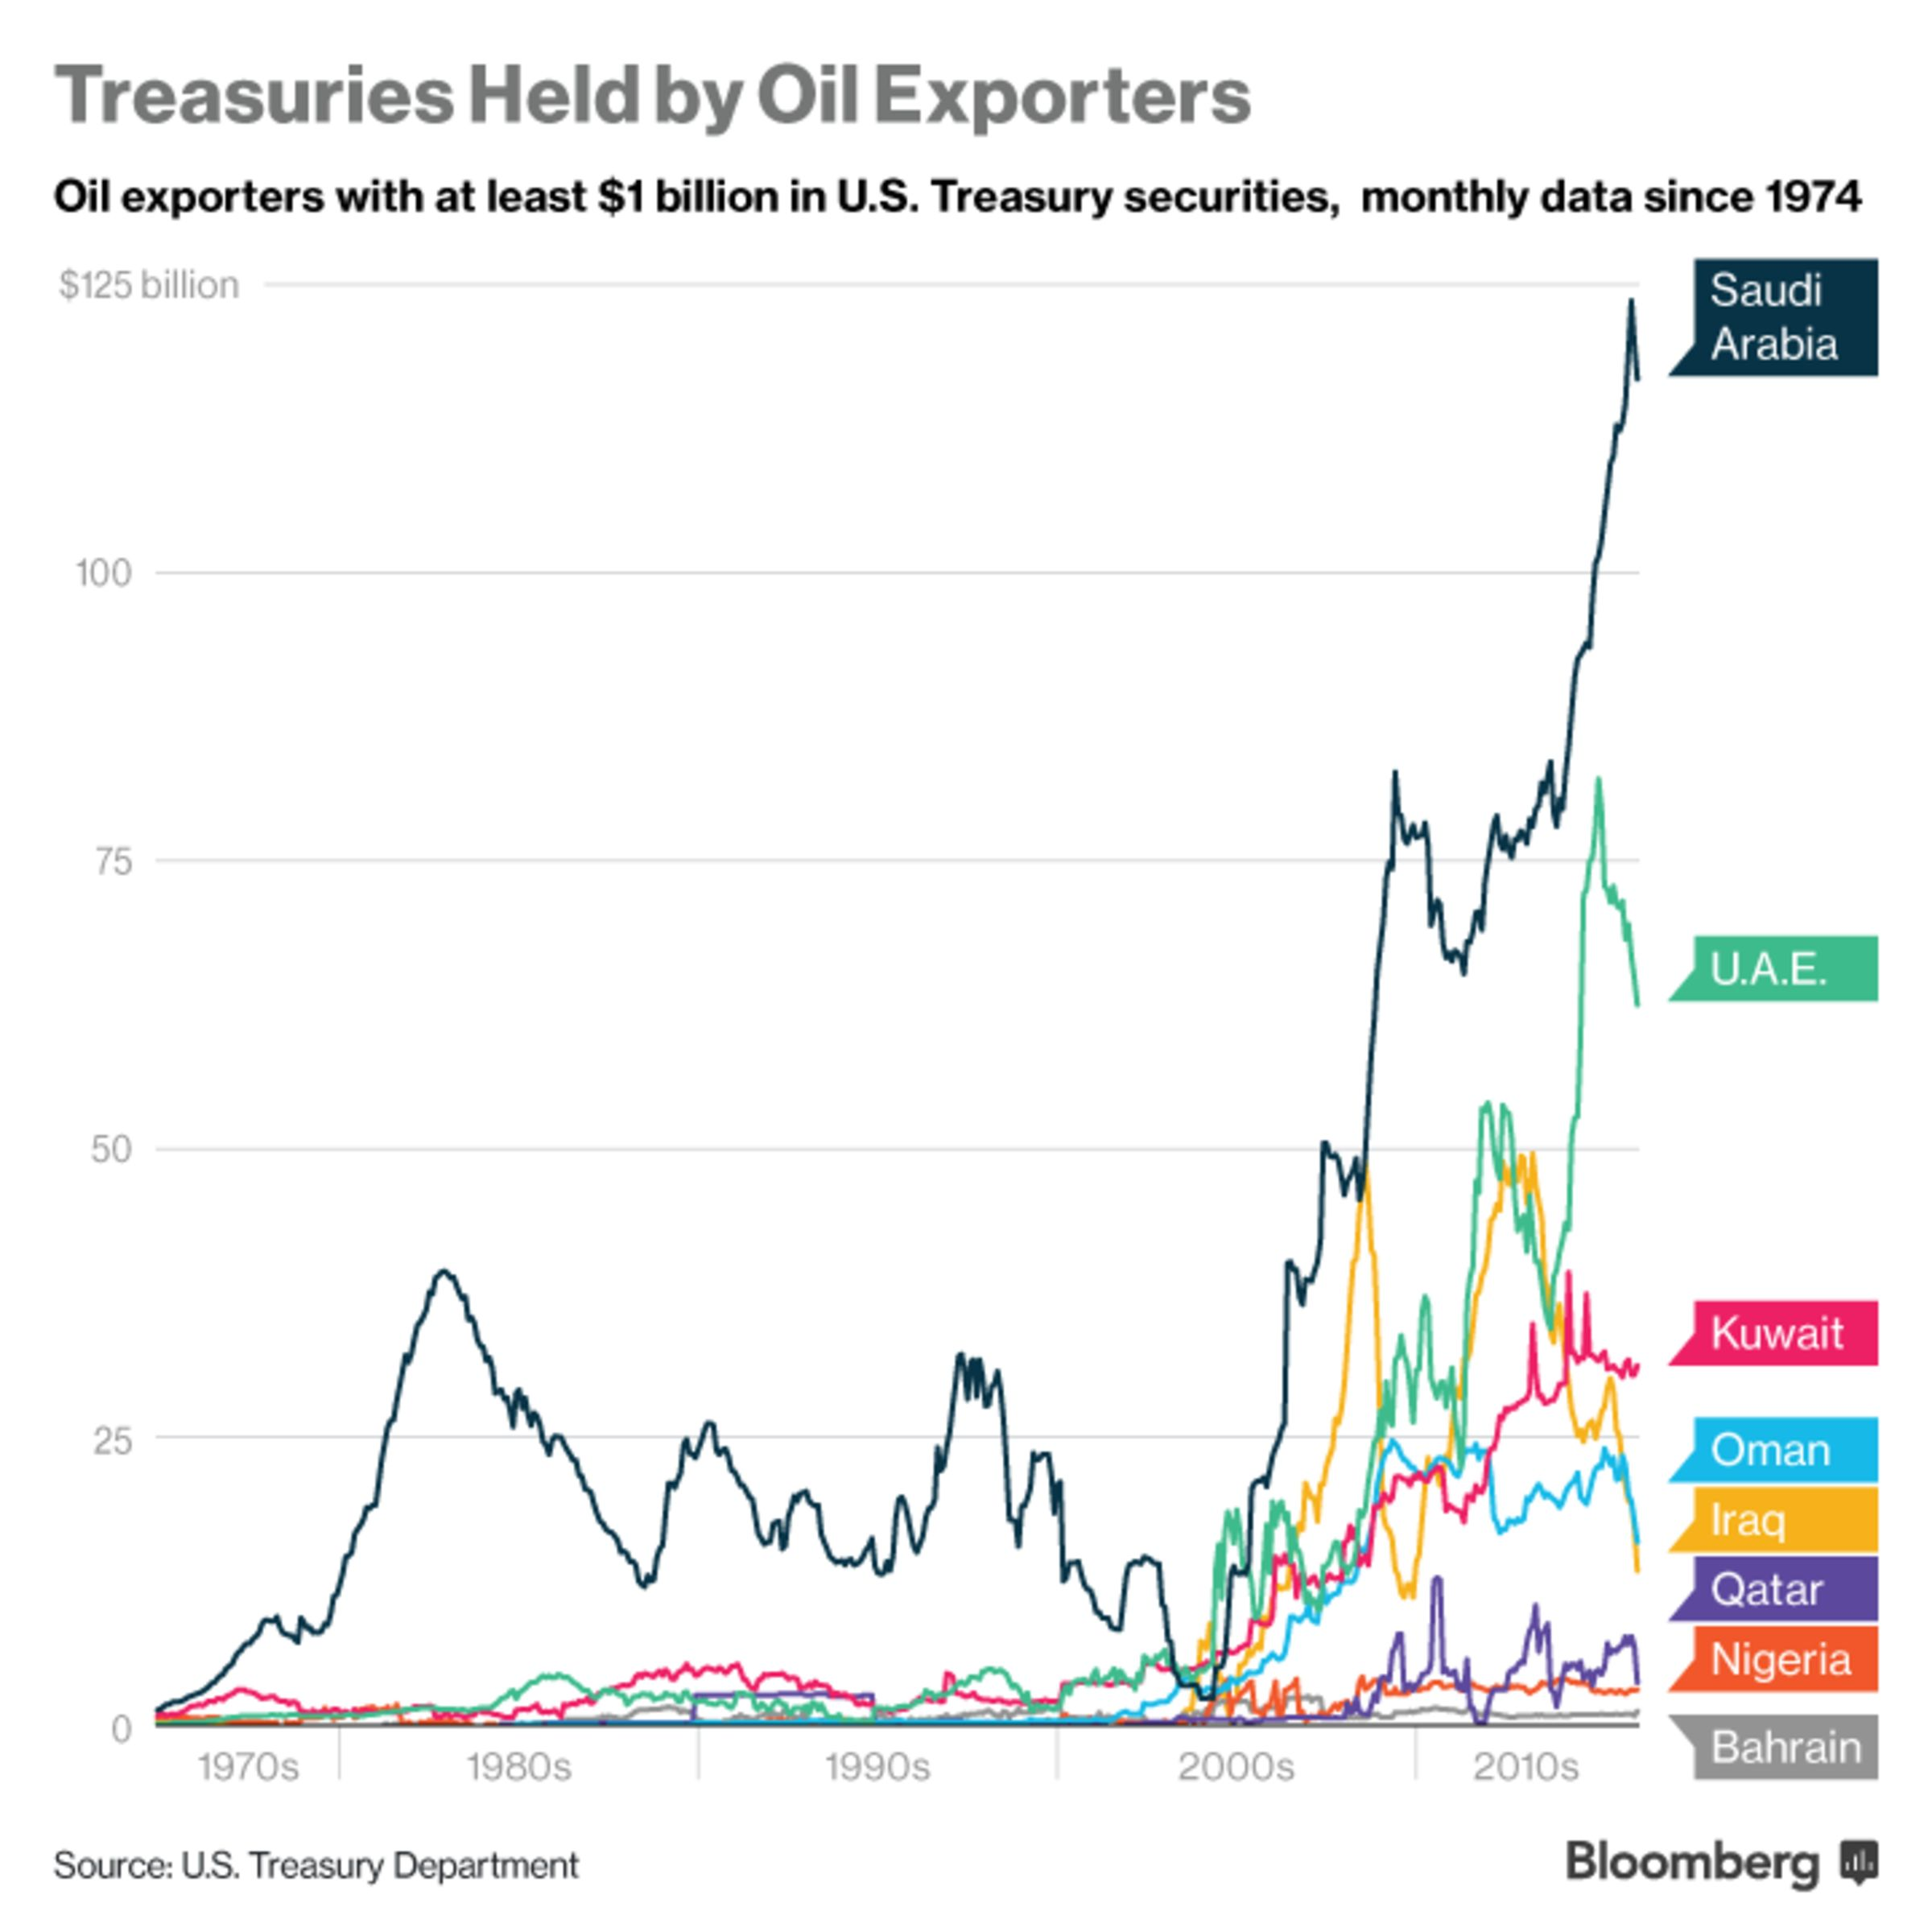 Graphic: Treasuries Held by Oil Exporters